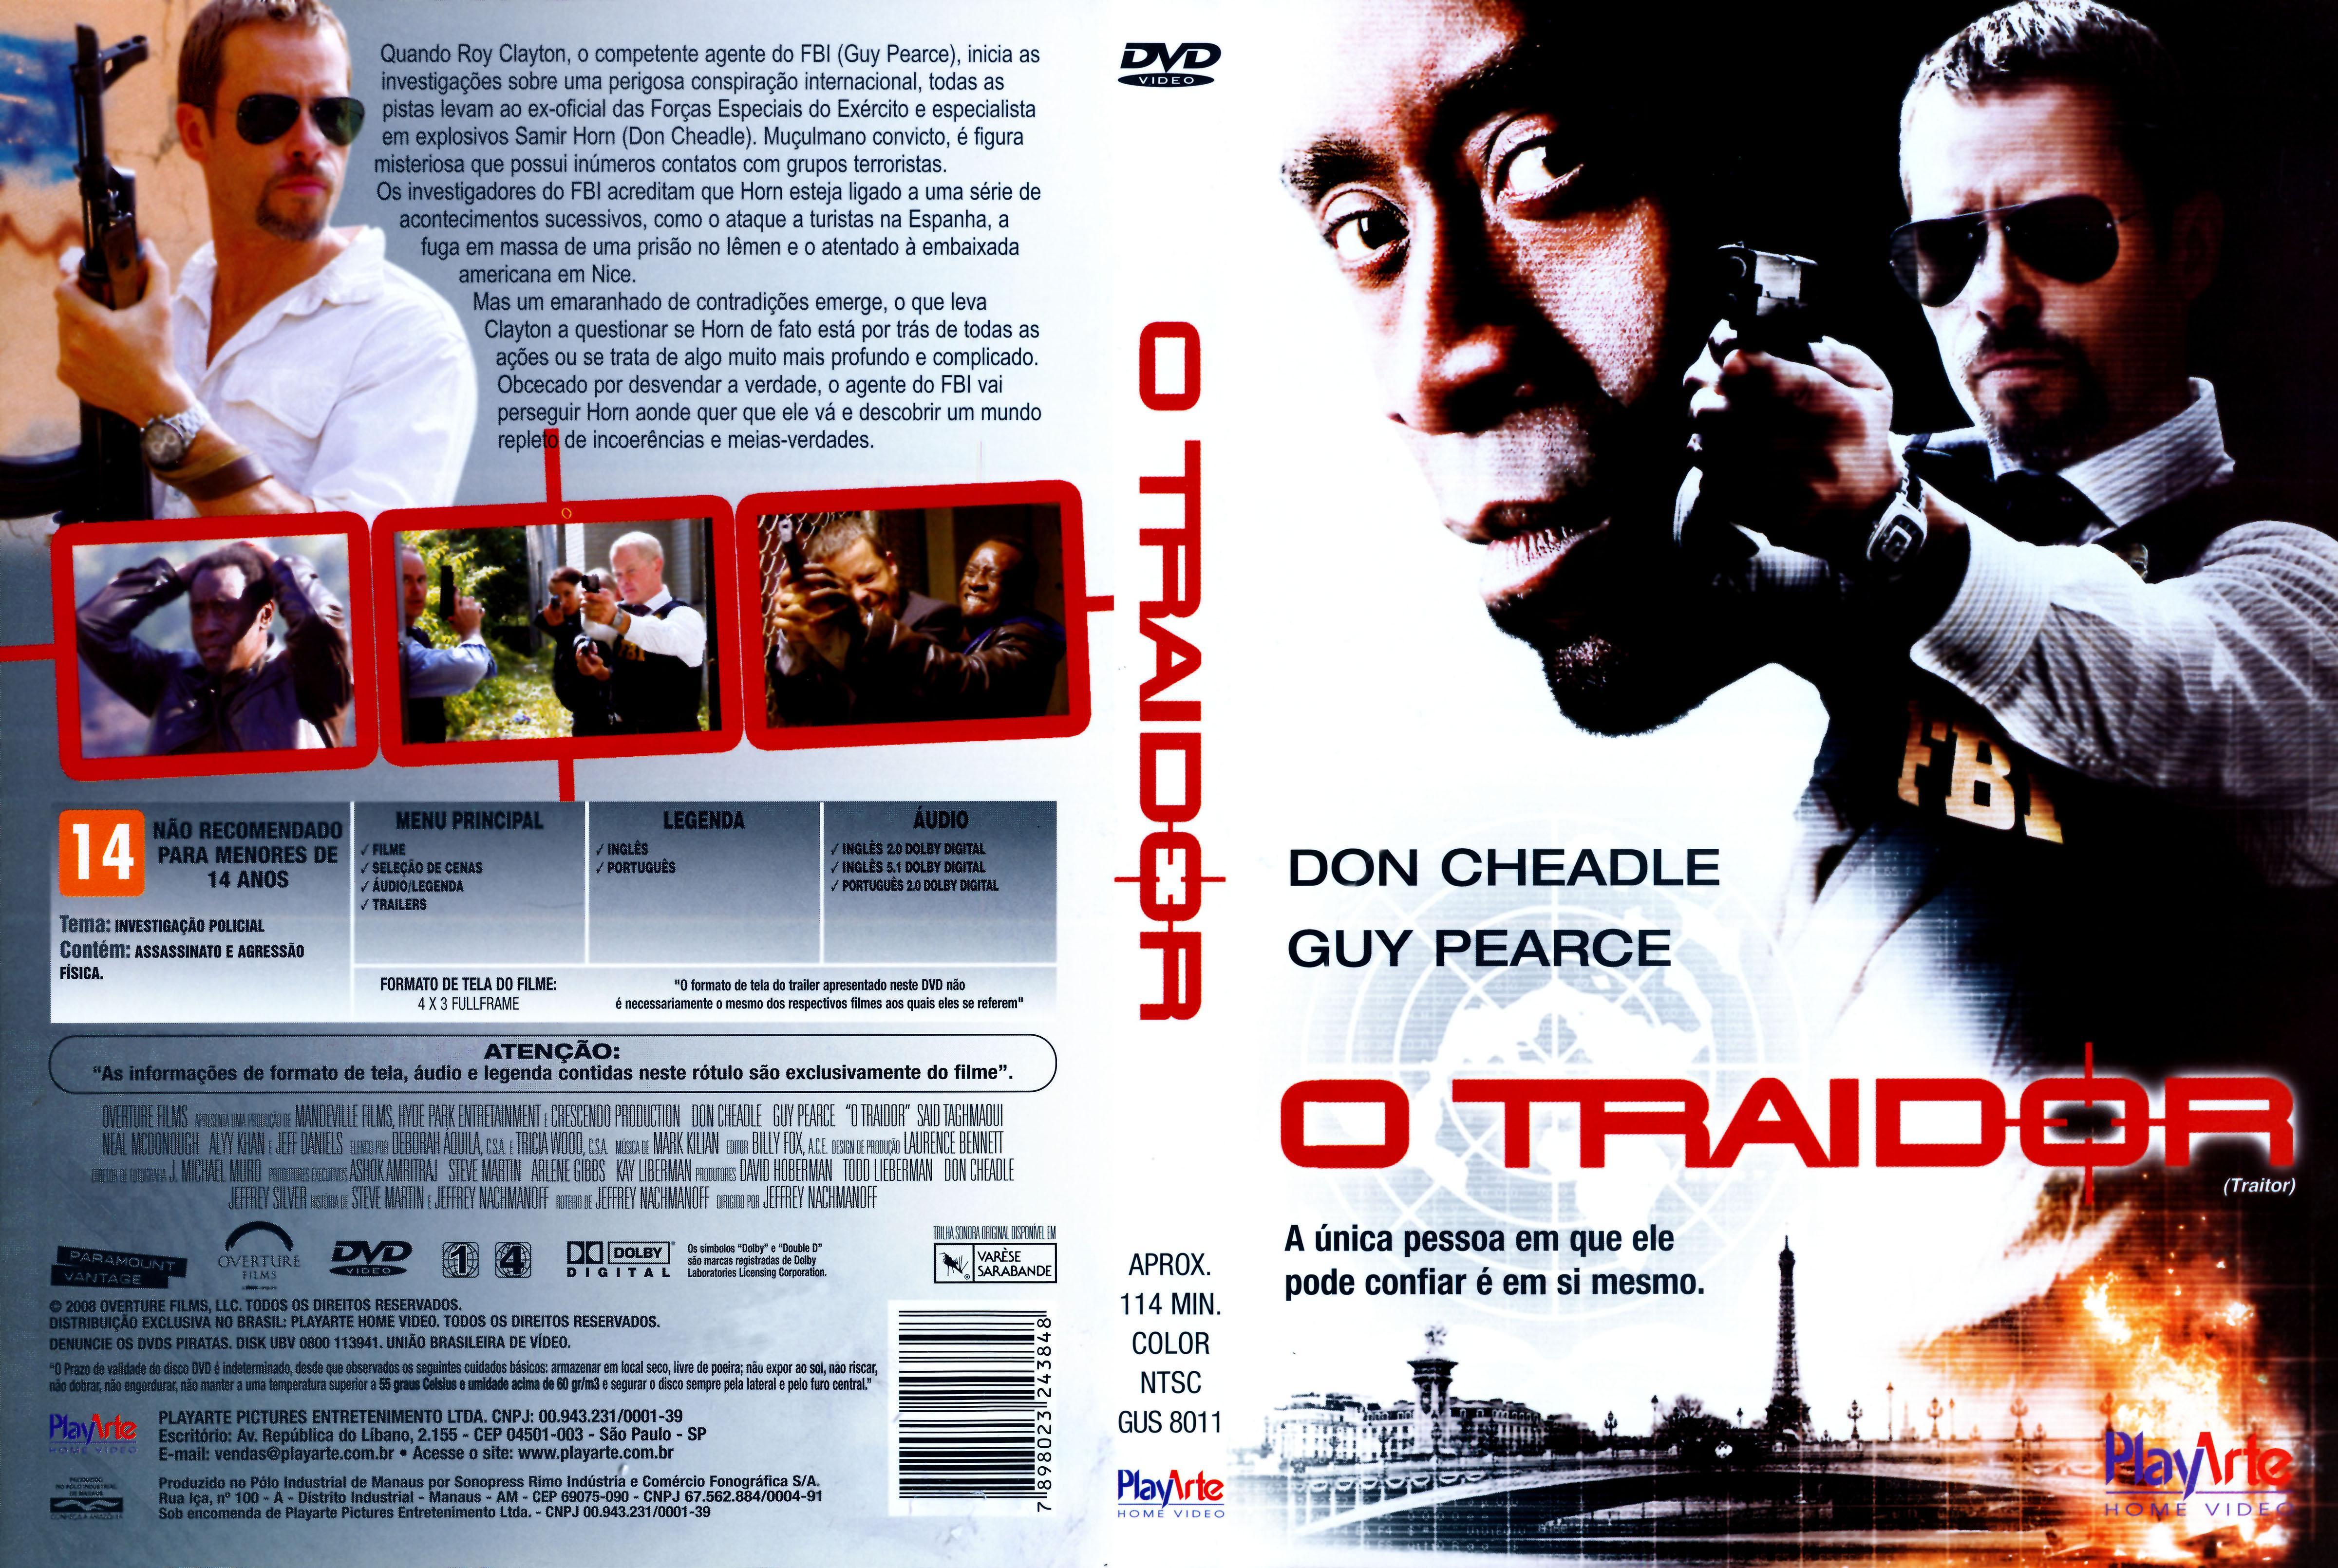 OTraidor